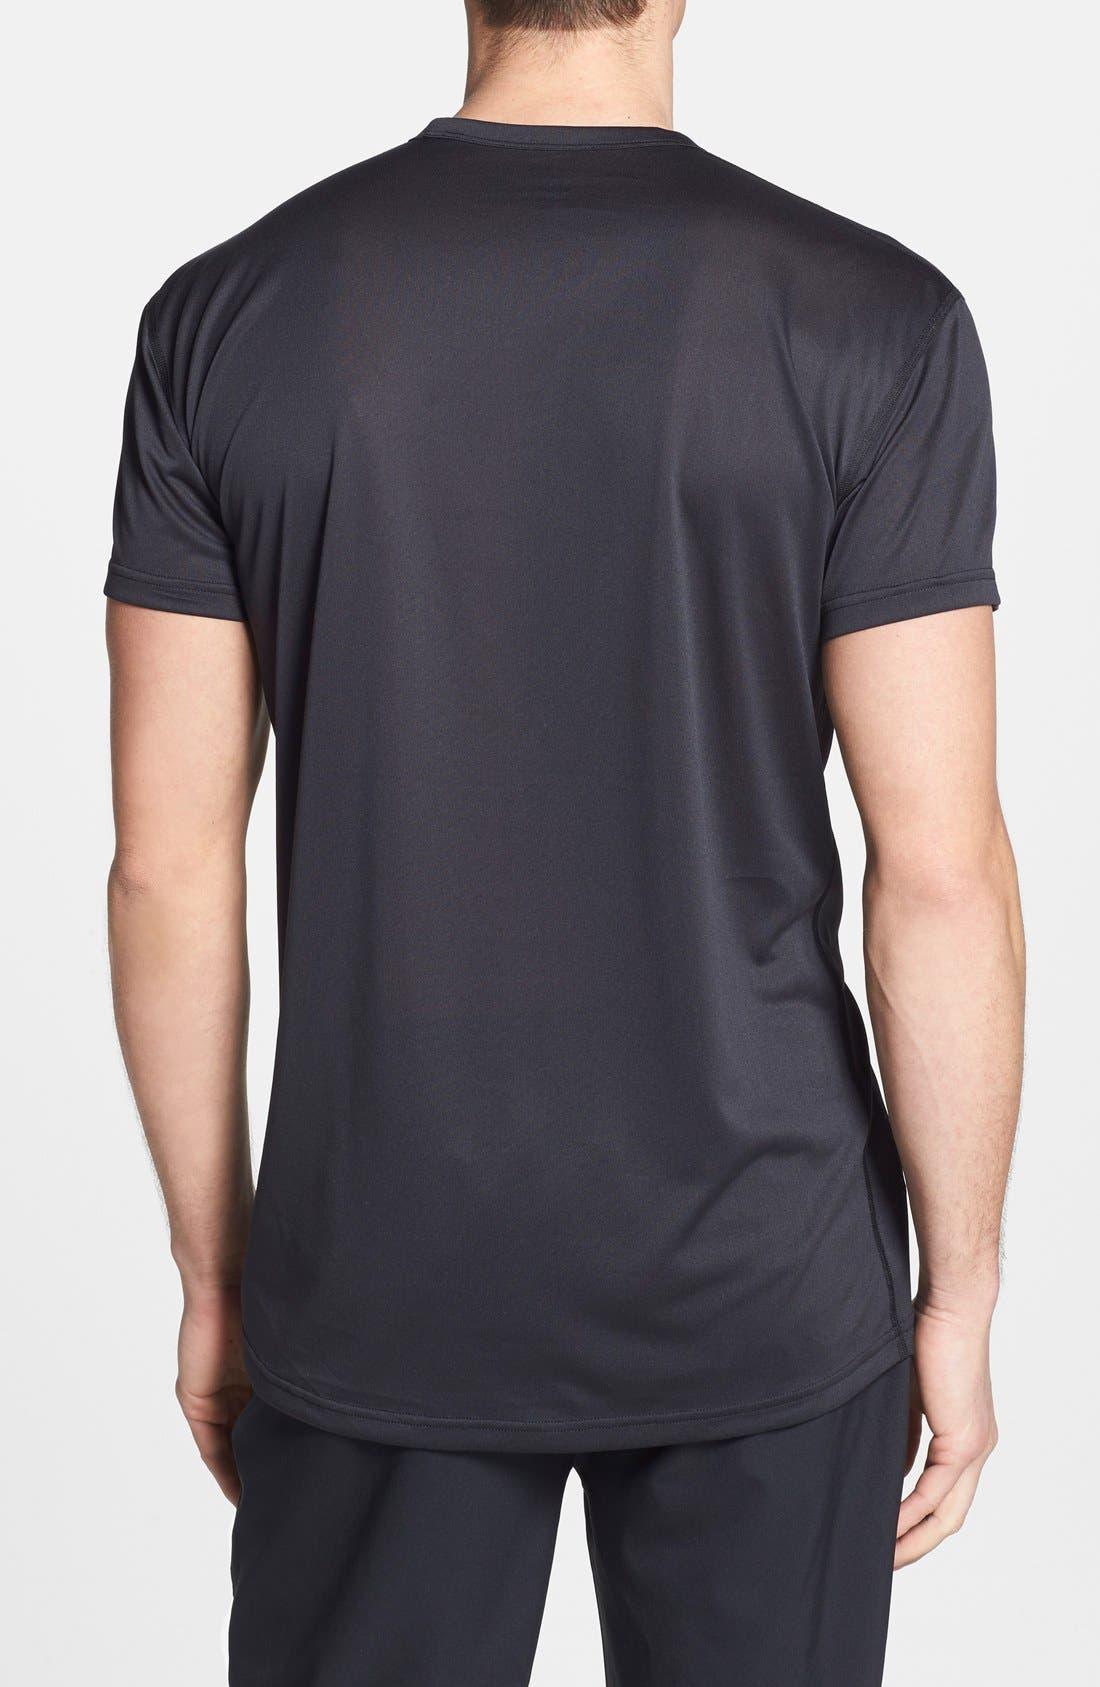 HELLY HANSEN,                             'VTR' Quick Dry T-Shirt,                             Alternate thumbnail 3, color,                             001